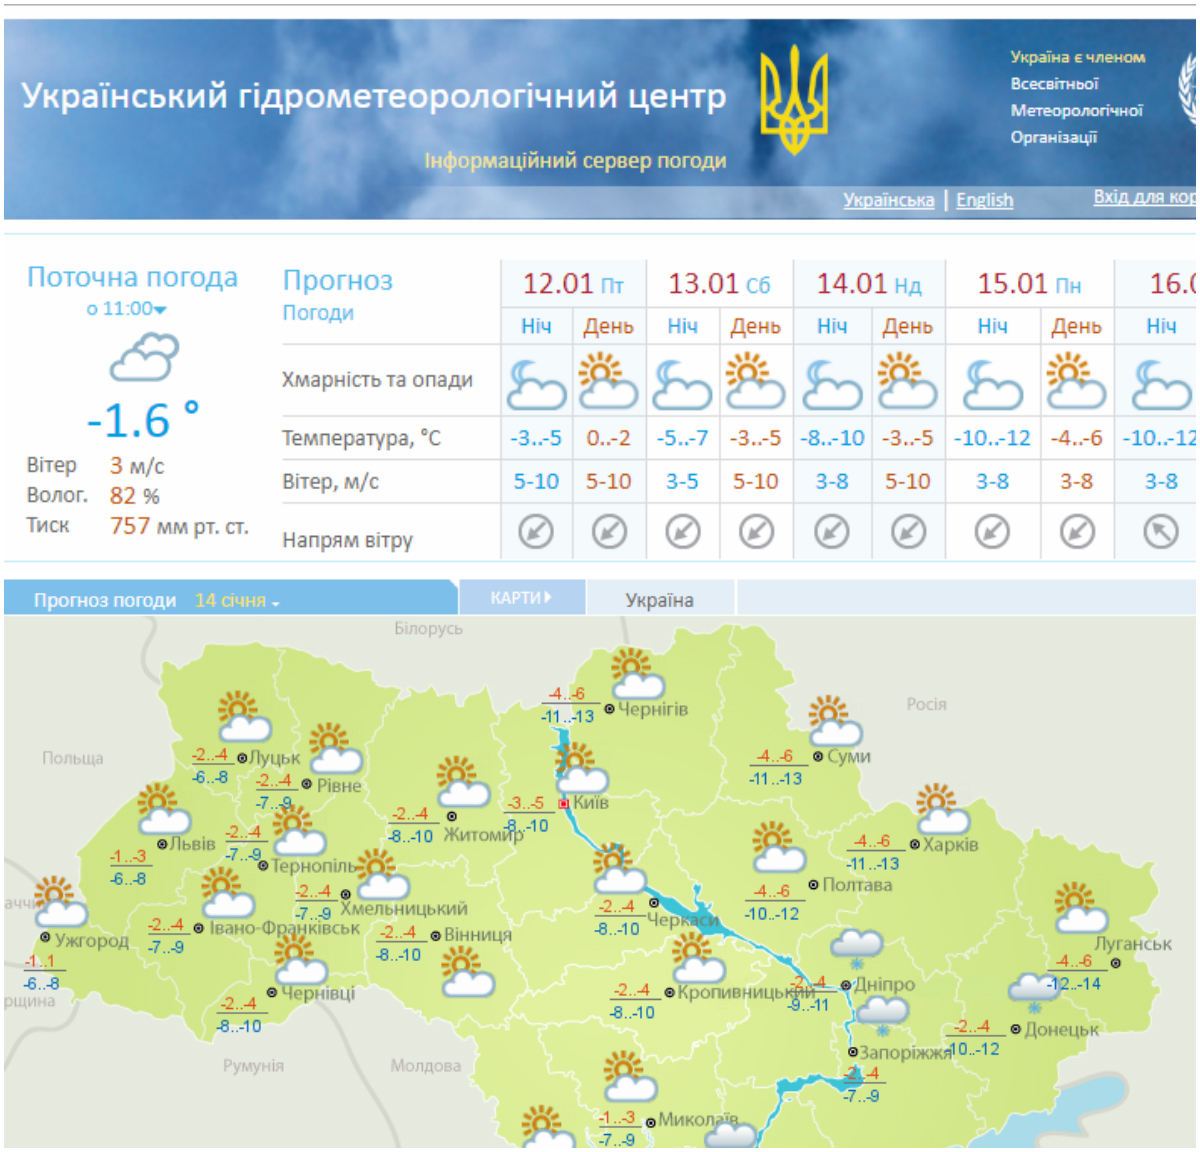 Прогноз погоды на 14 января 2018 года